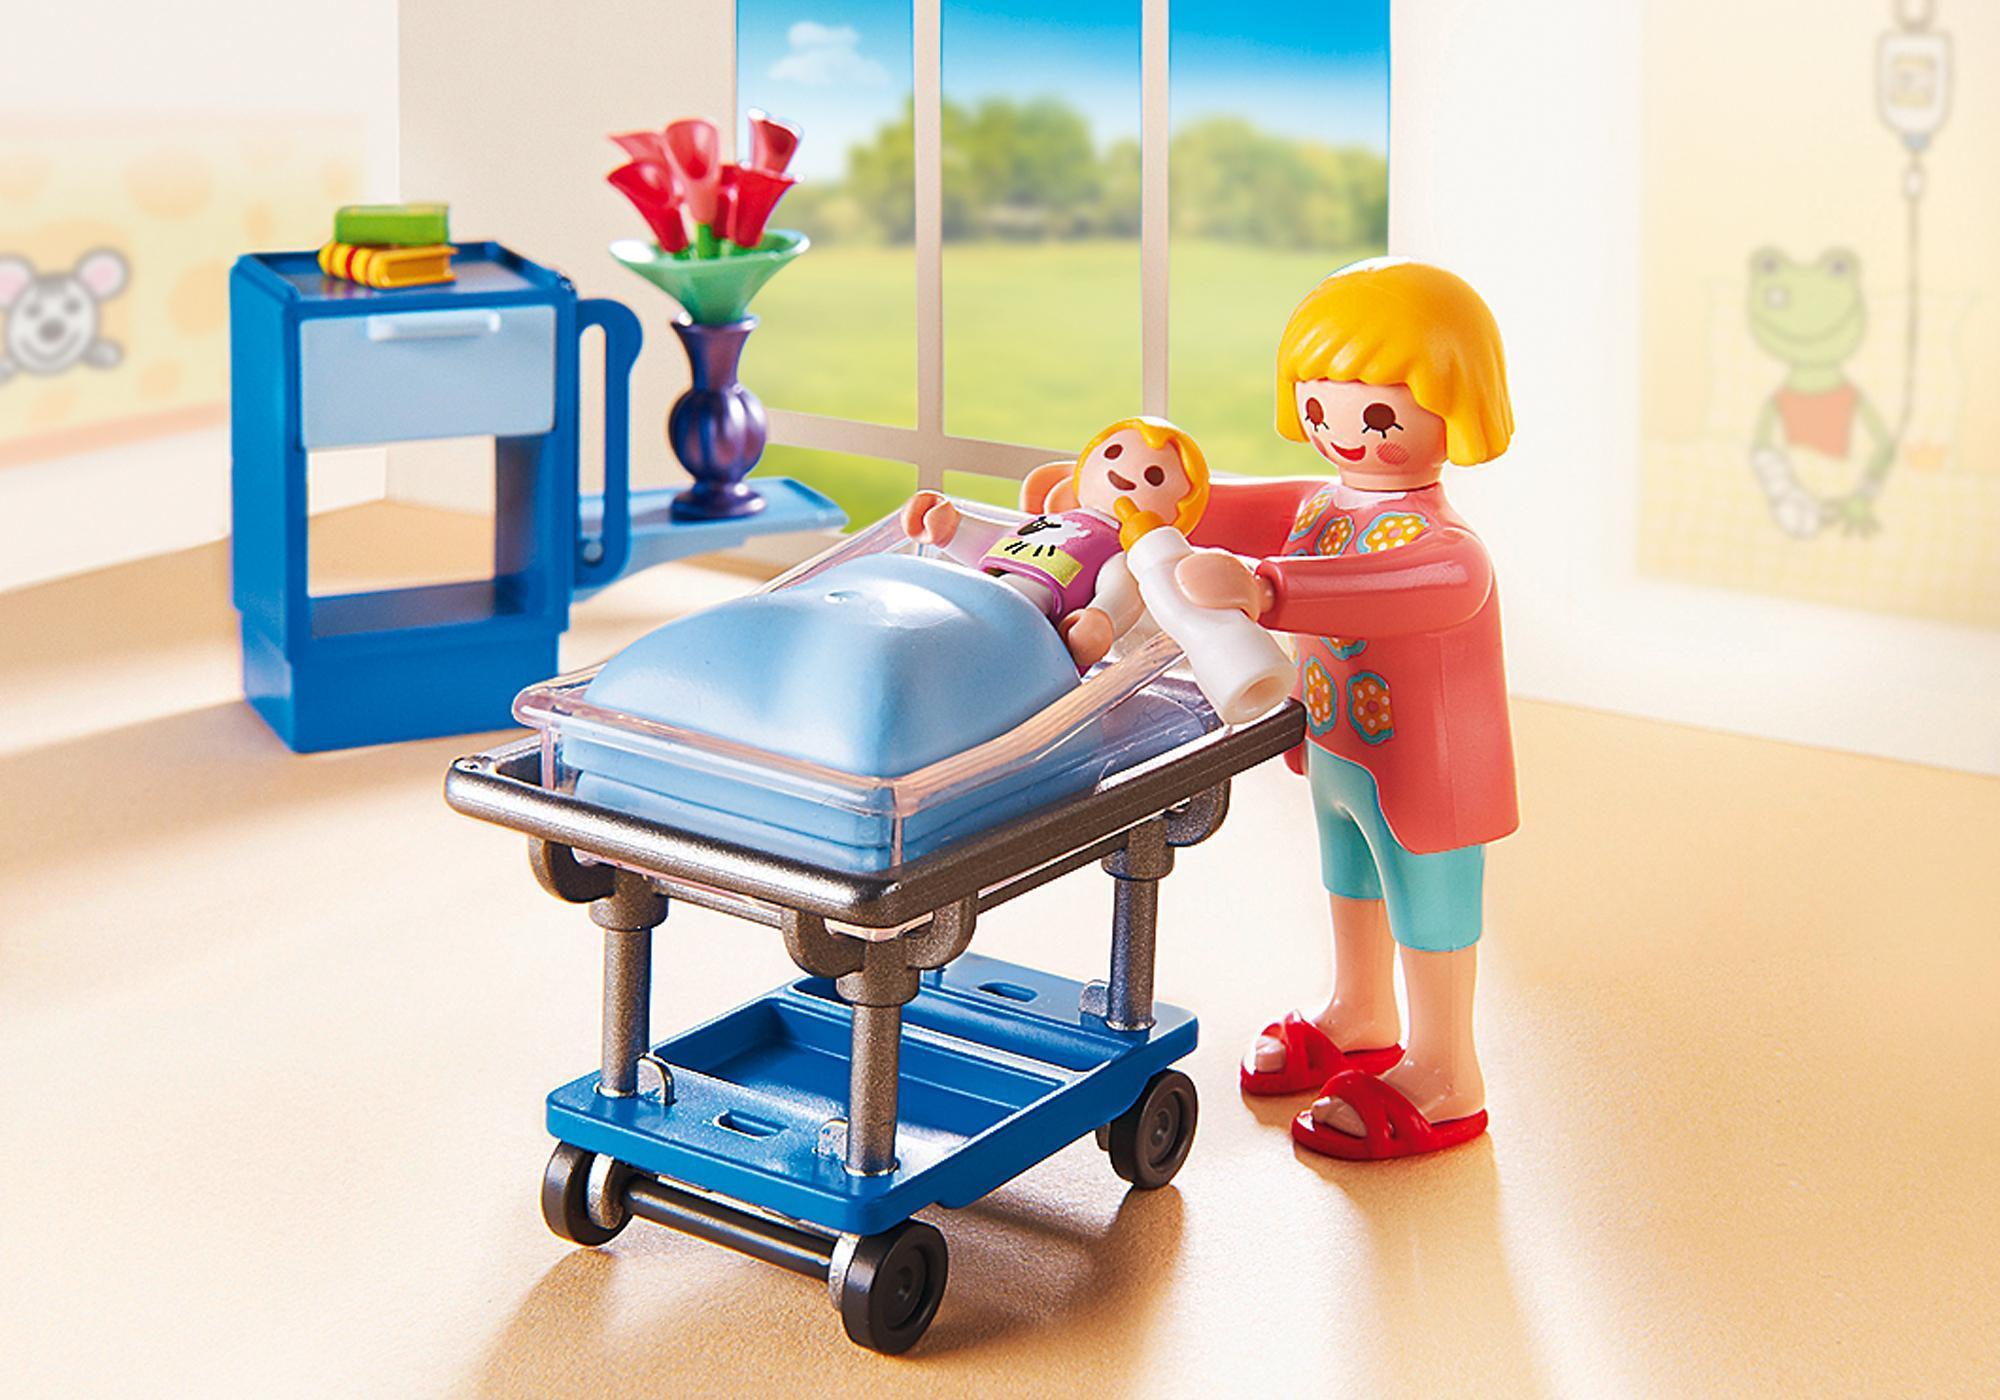 http://media.playmobil.com/i/playmobil/6660_product_extra1/Chambre de maternité